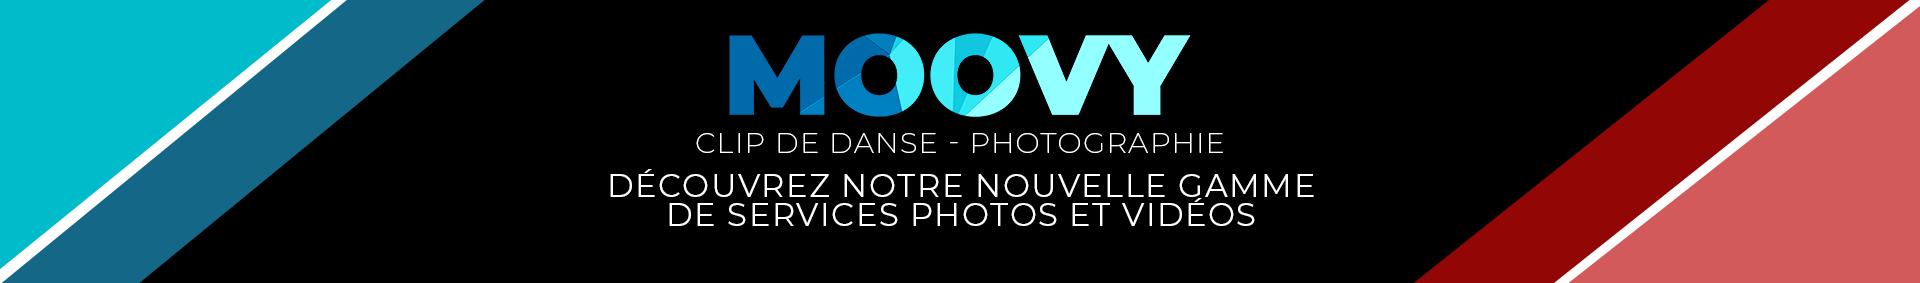 Moovy Nantes - Dance Clip Seance photo